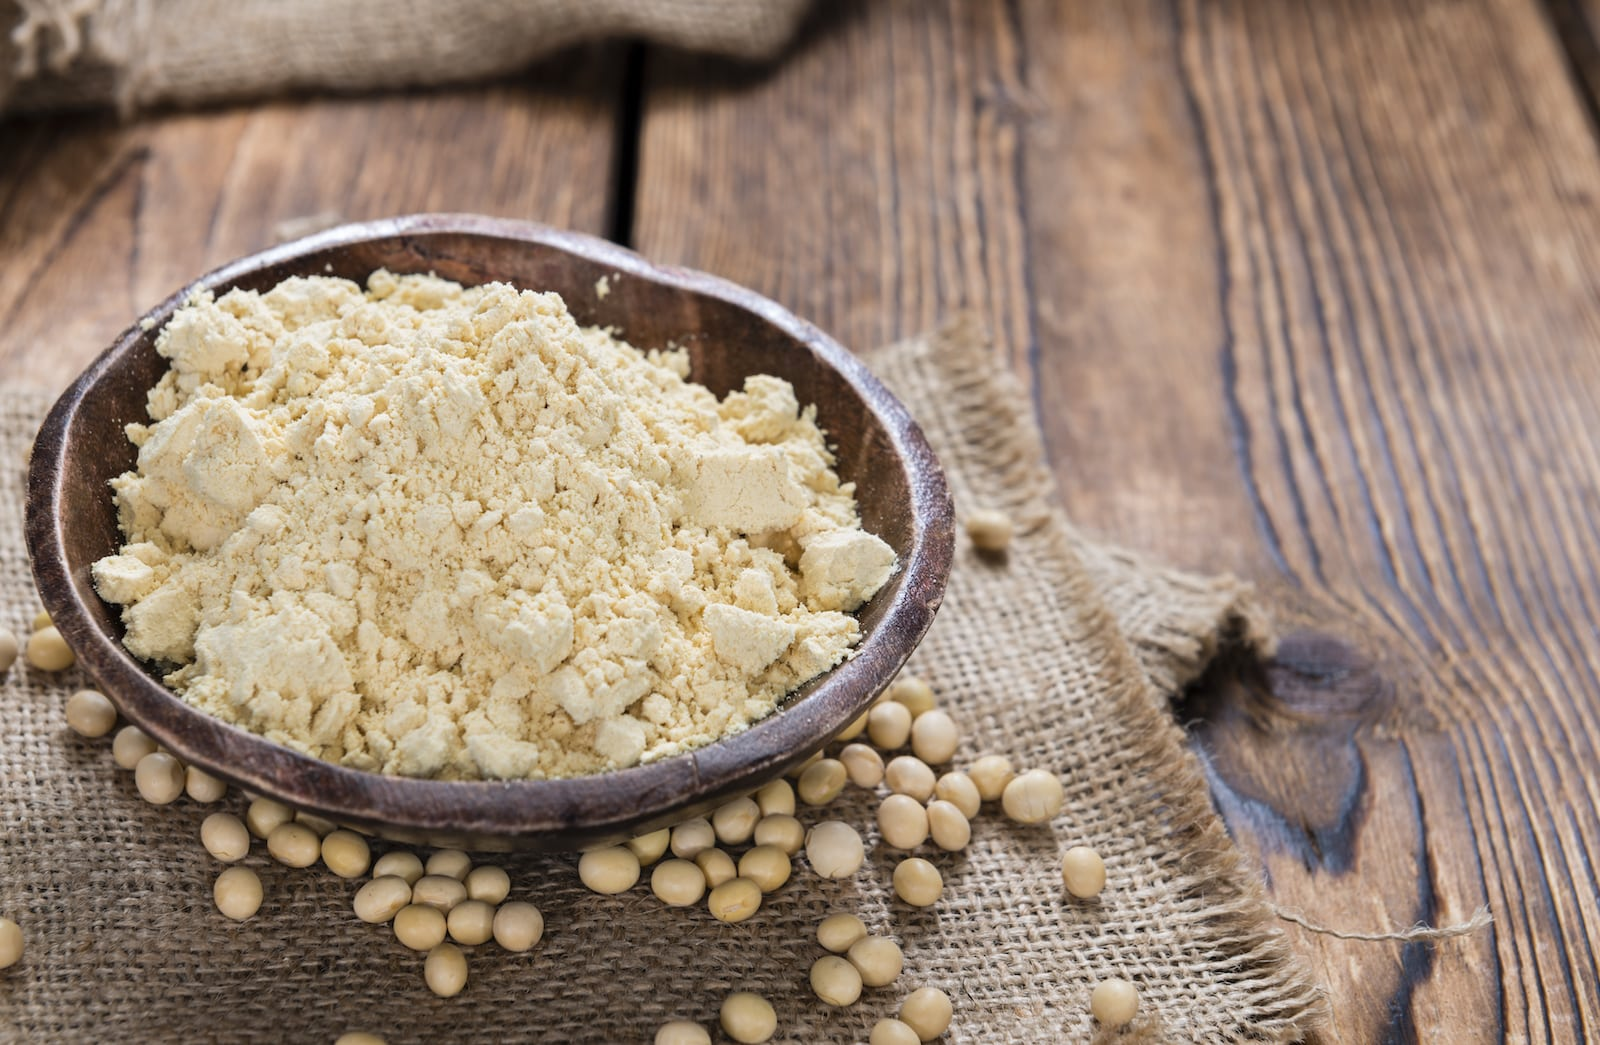 Soy Flour: A Protein-Rich Chinese Flour